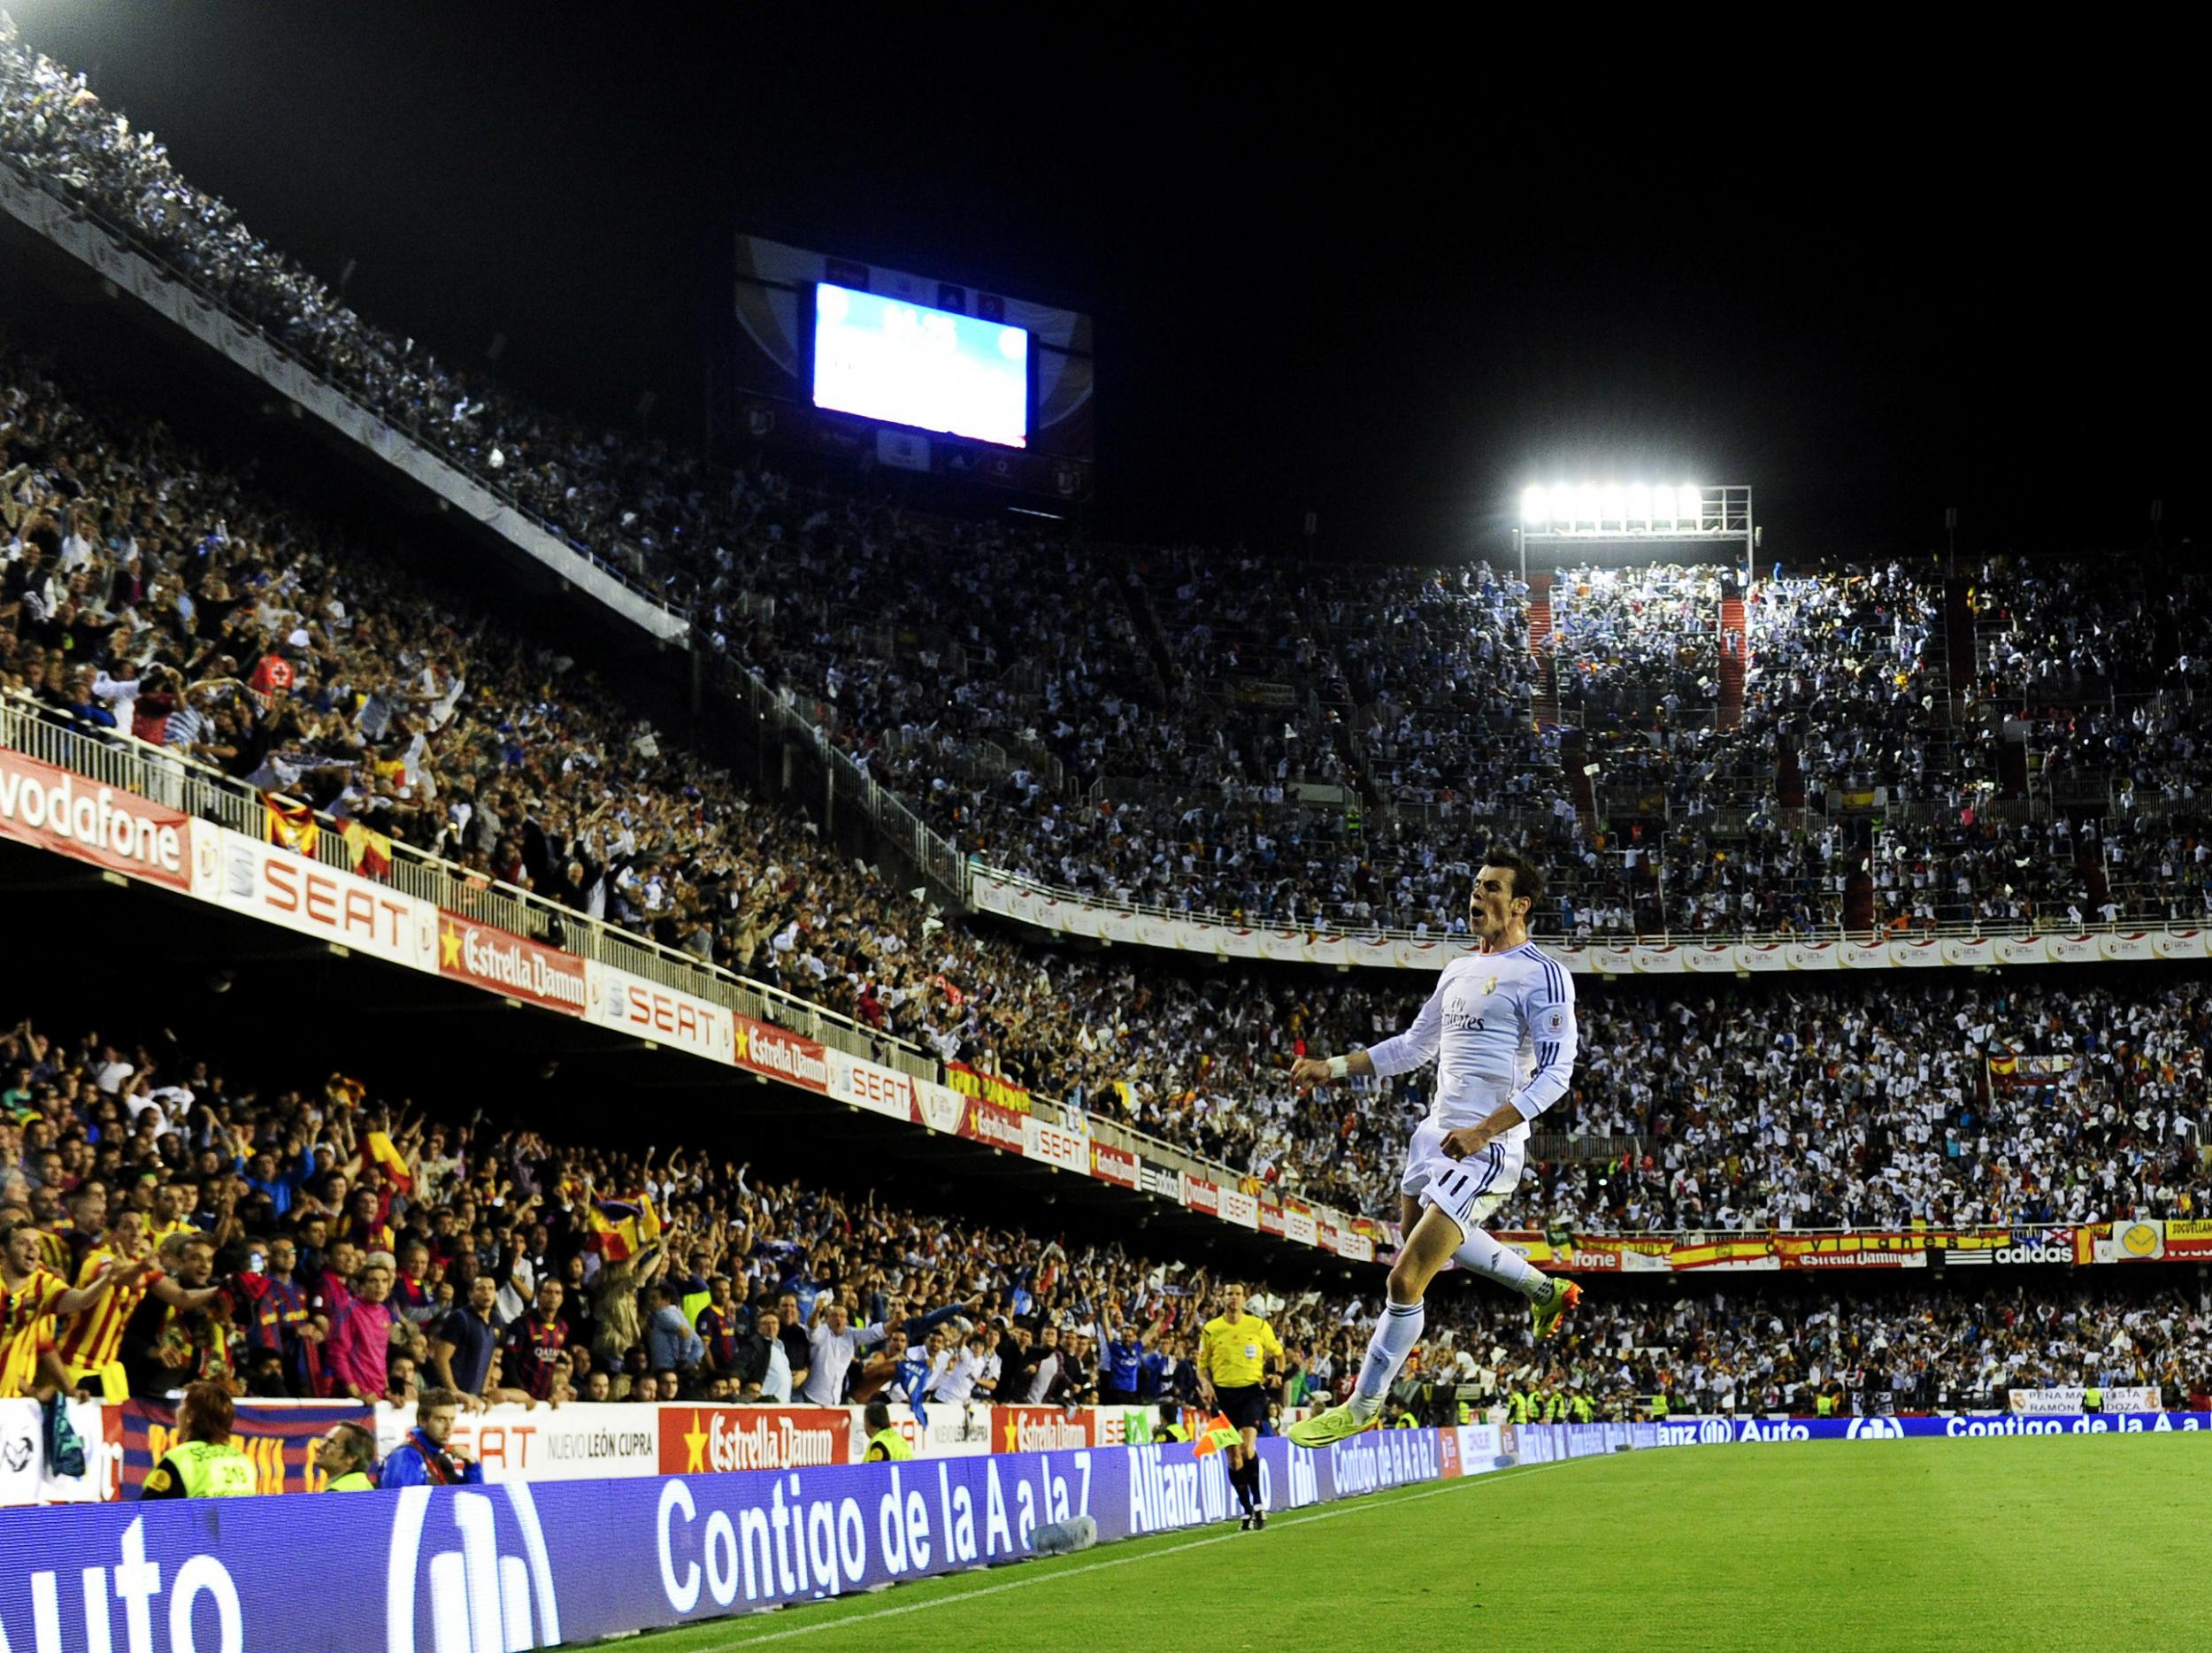 53. Gareth Bale